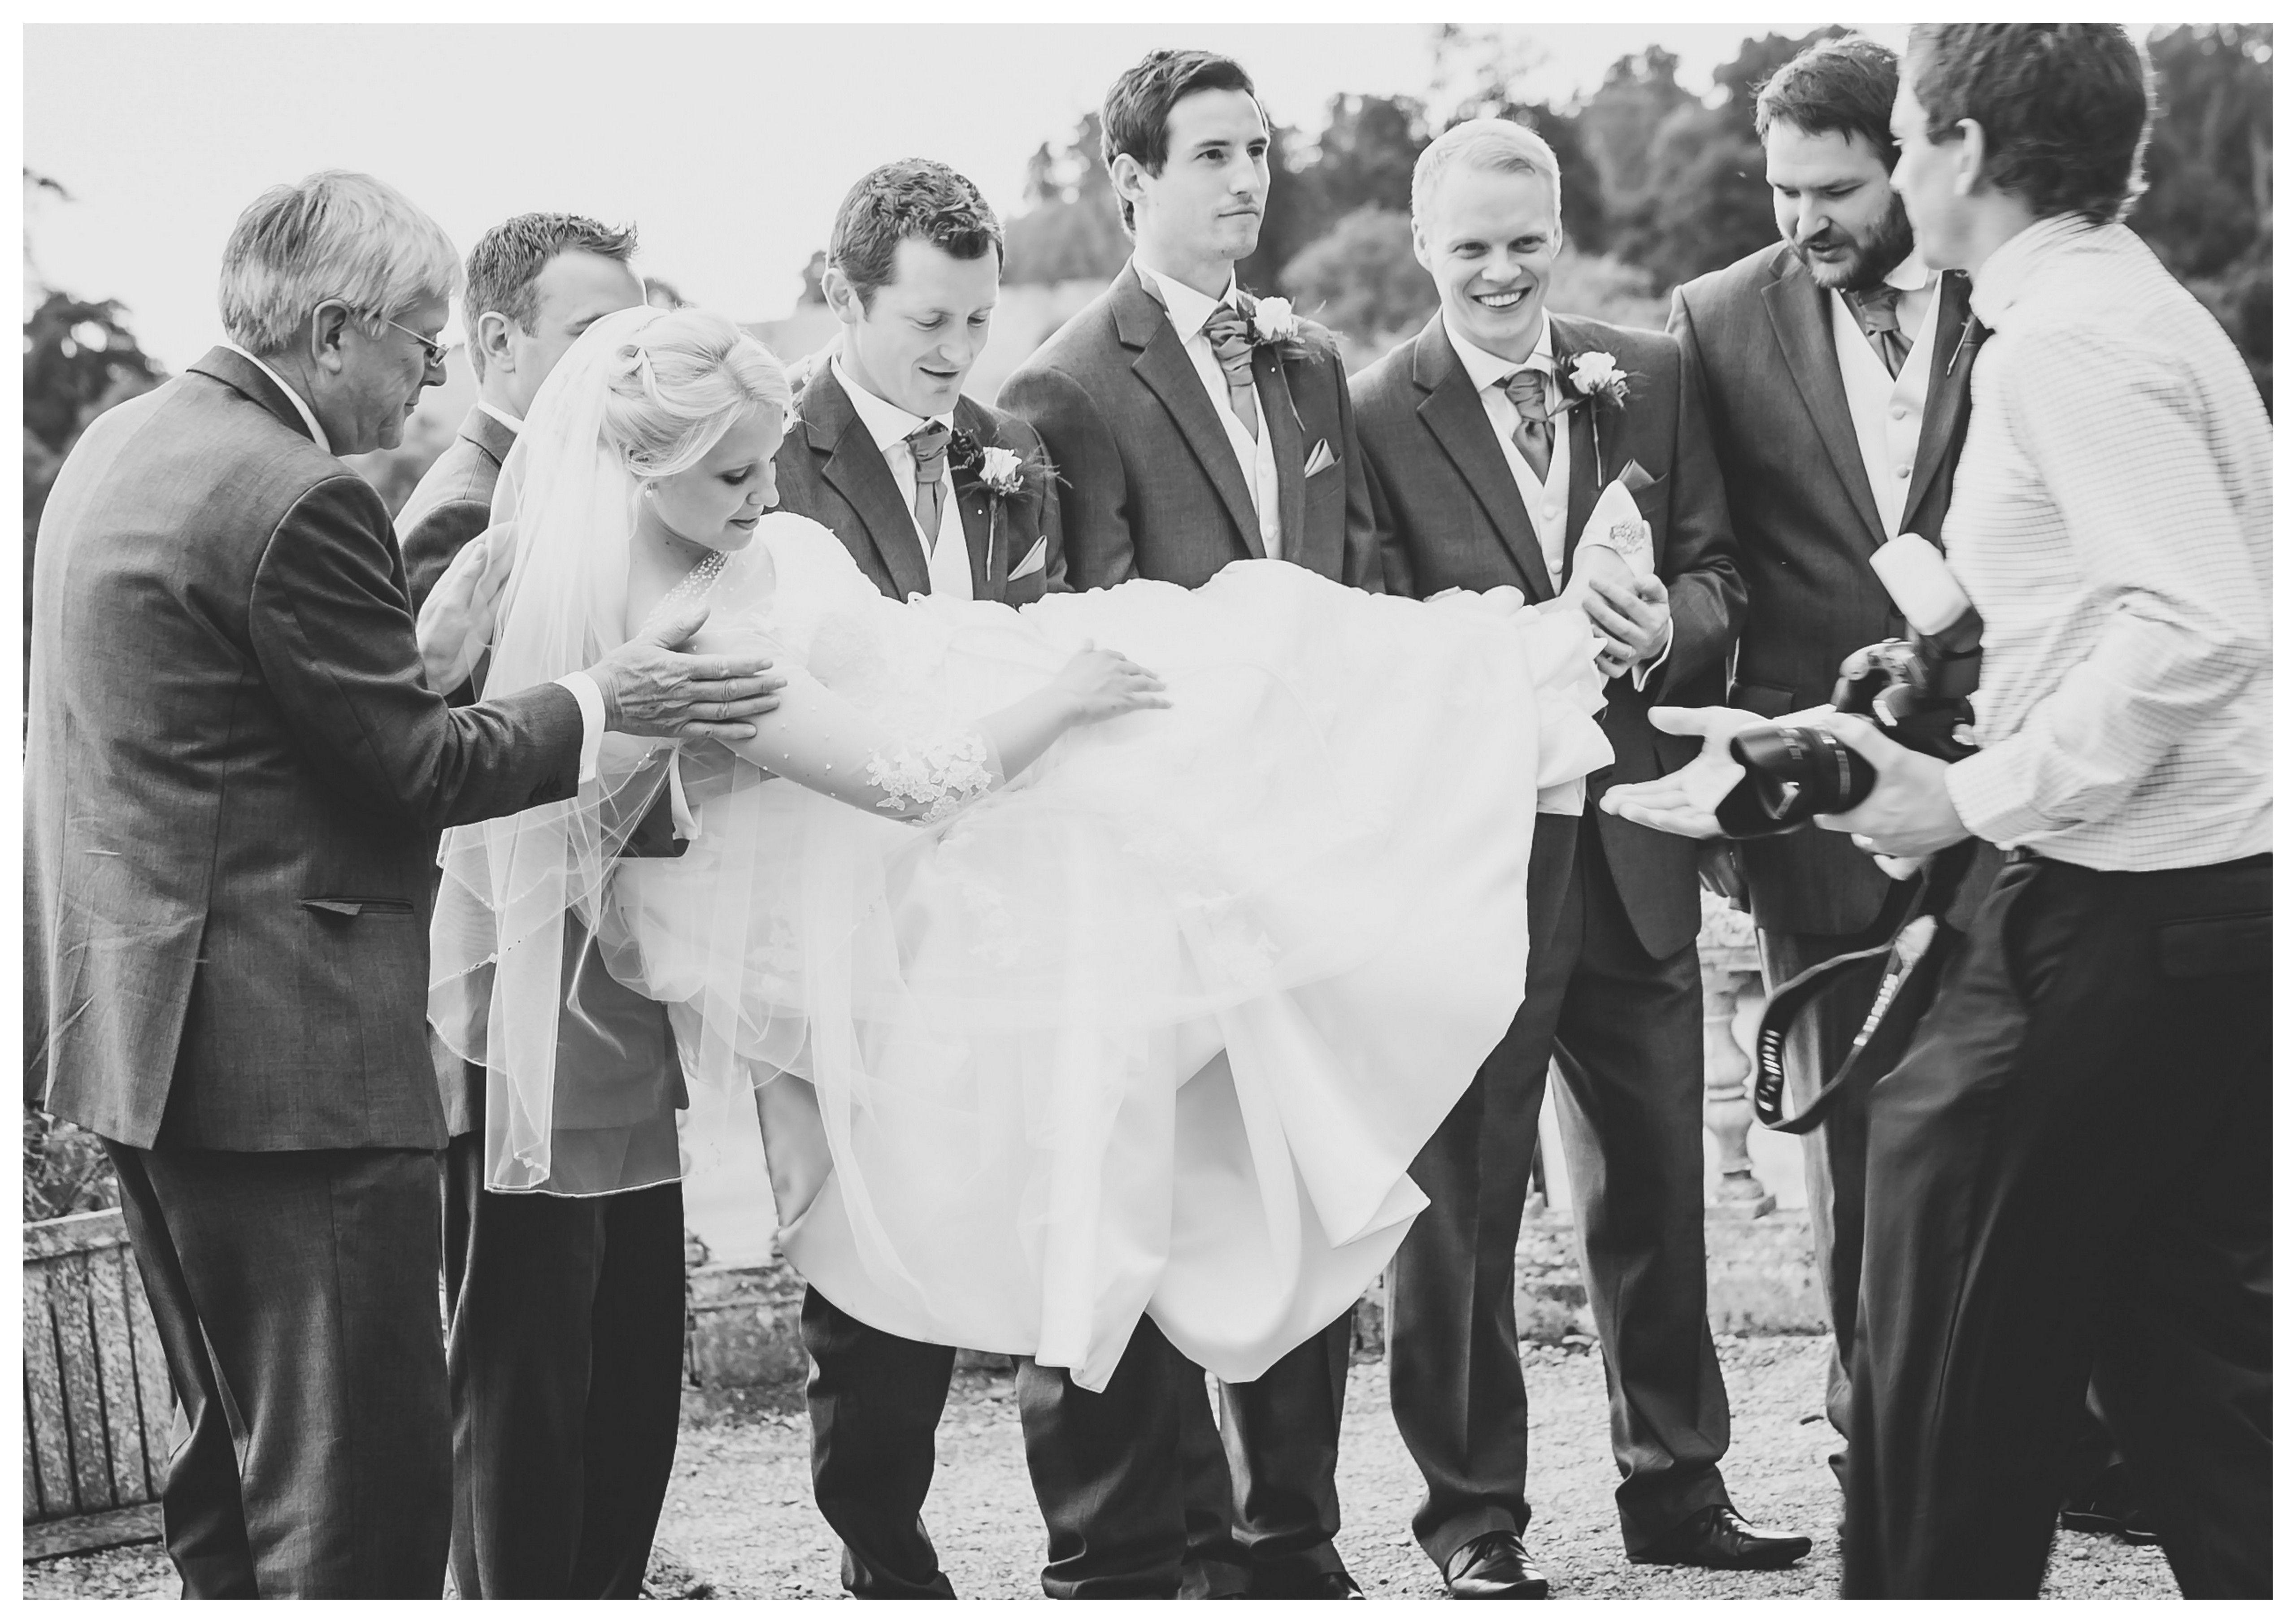 #bride #groomsmen #wedding #photo